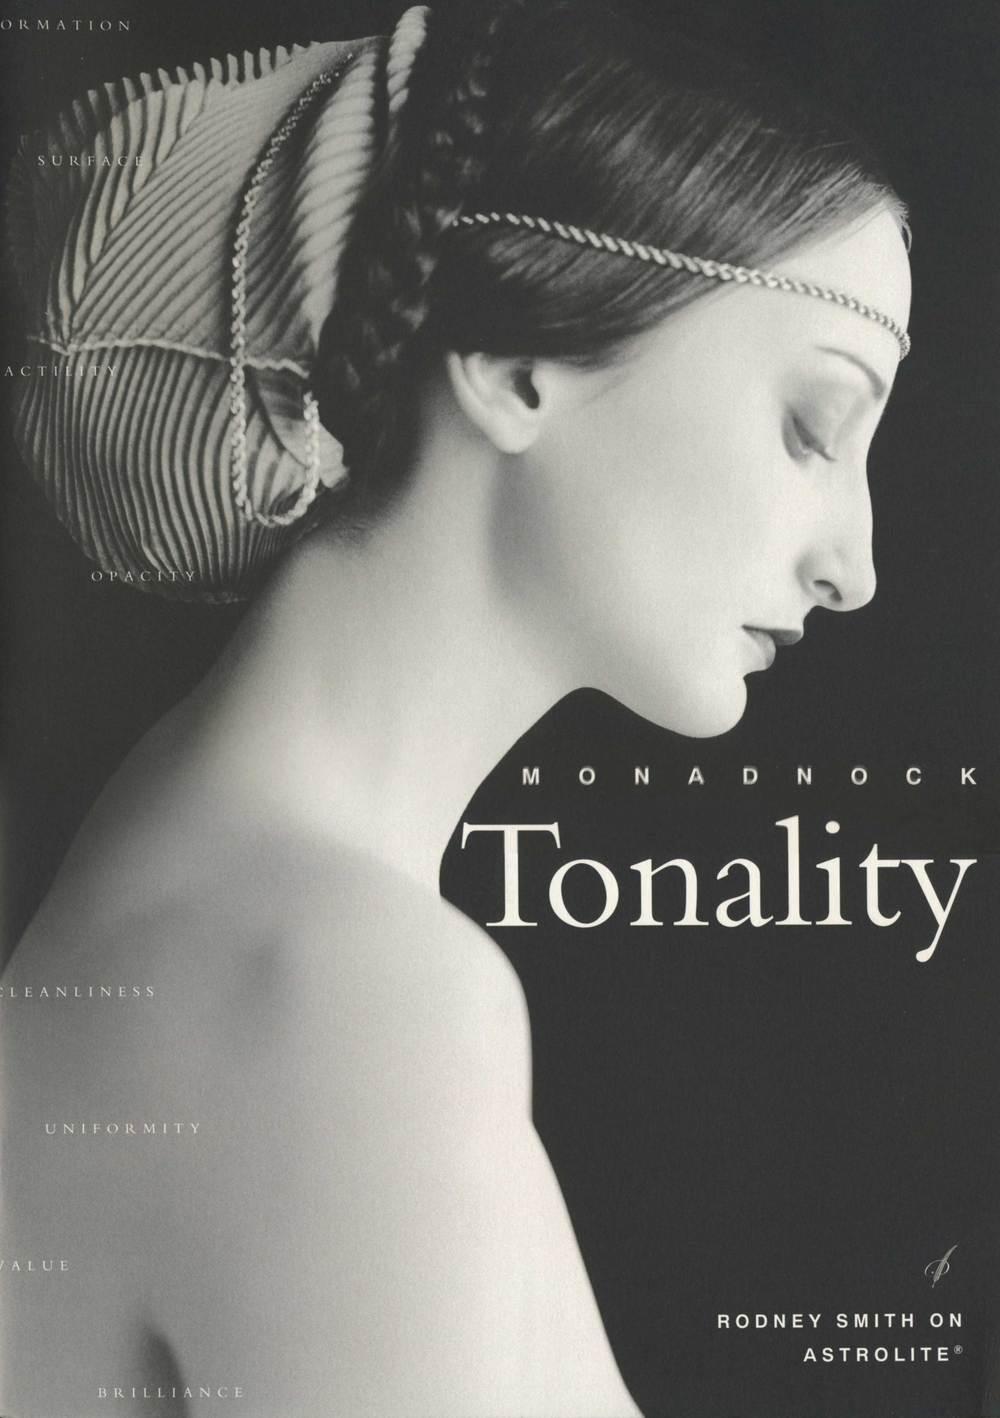 tonality-cover.jpg